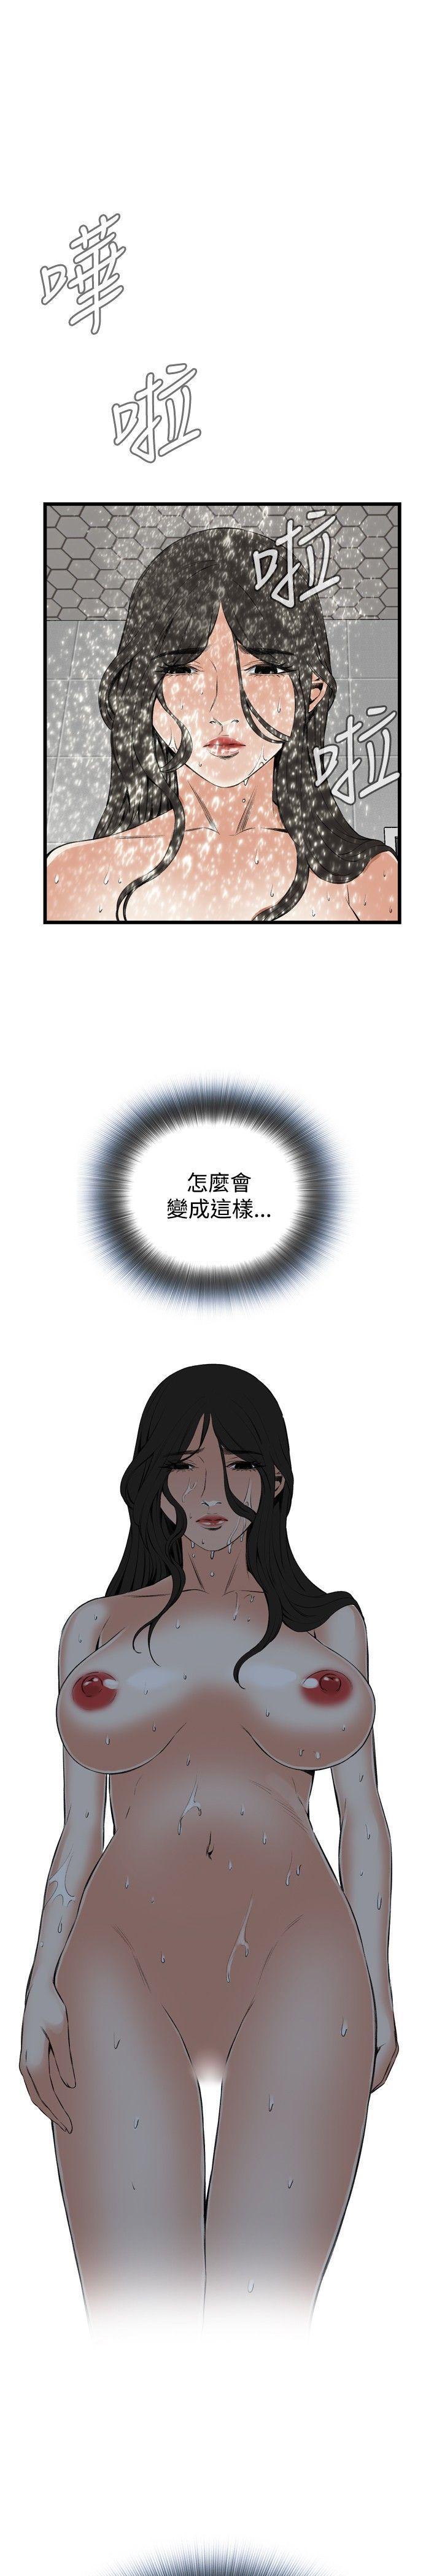 Take a Peek 偷窥 Ch.39~55 [Chinese]中文 495